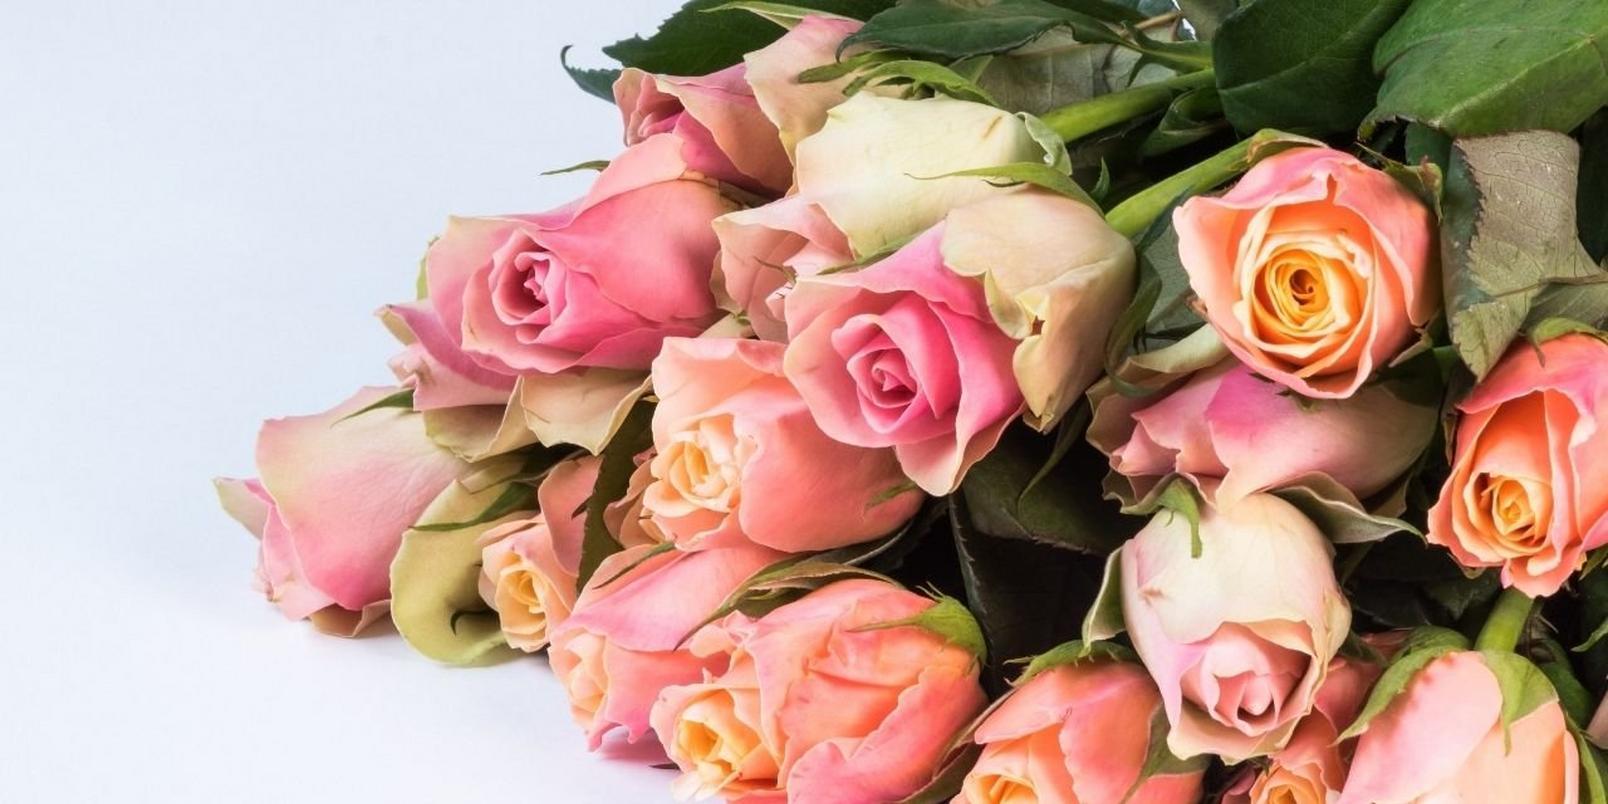 Pink-rose-bunch-1